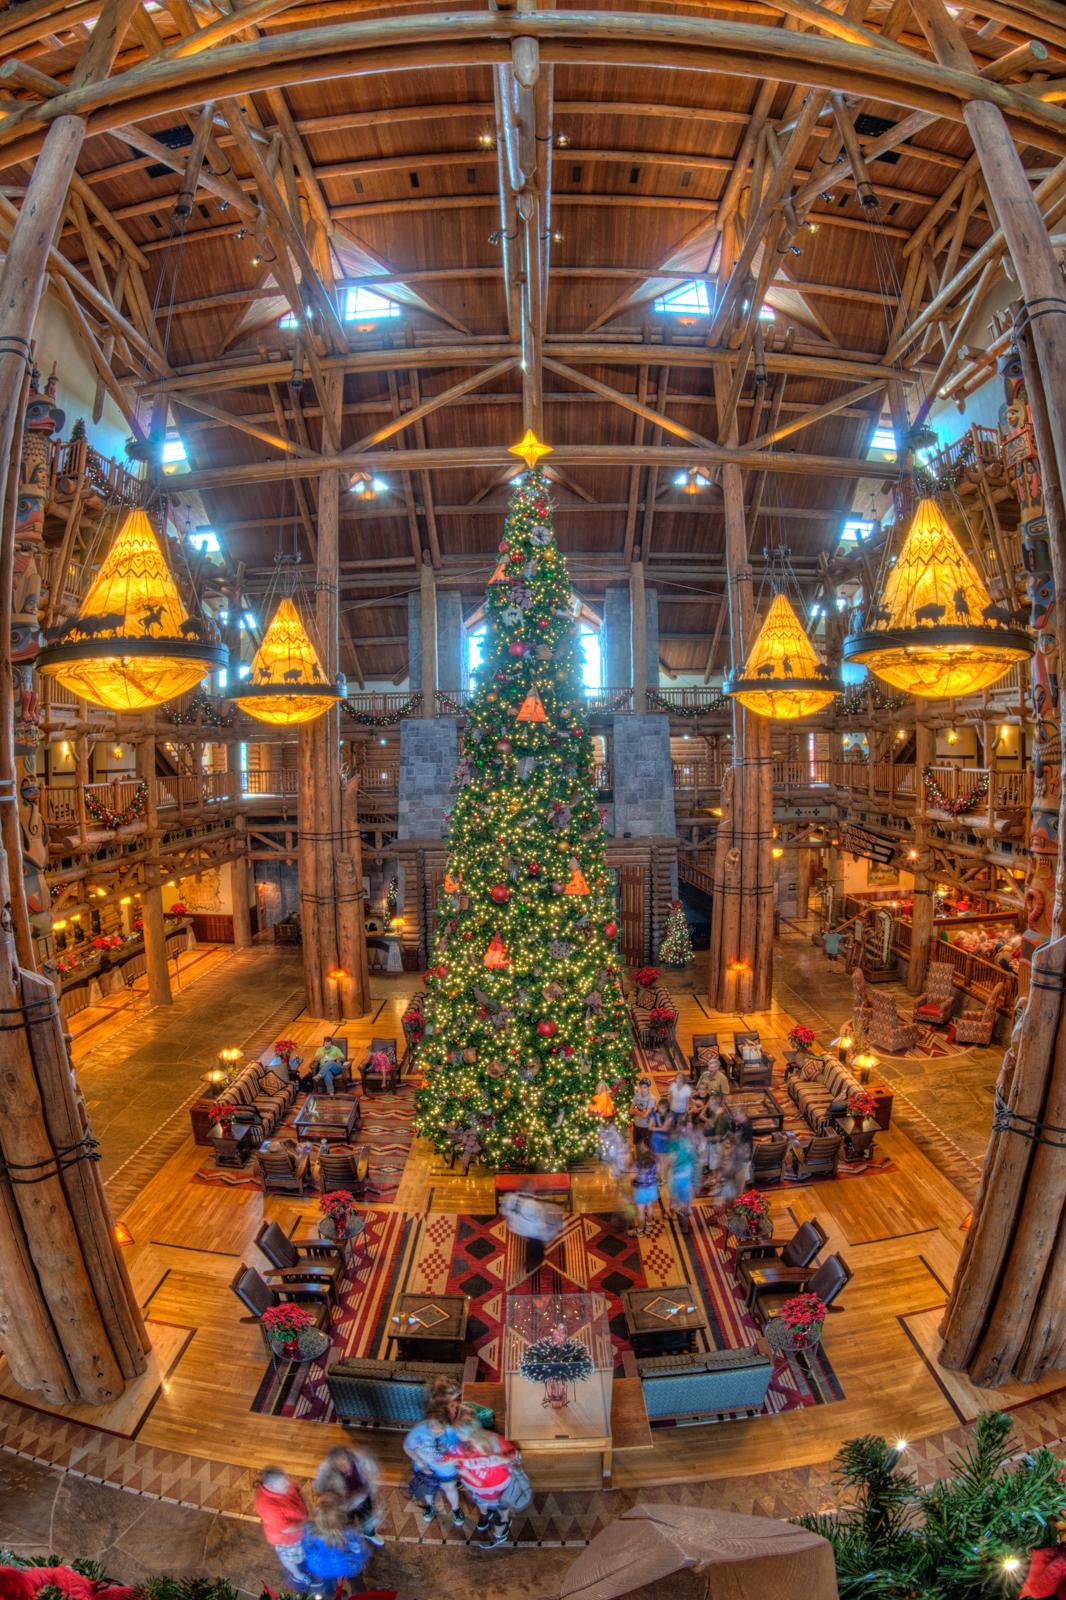 Disney's Wilderness Lodge at Christmas